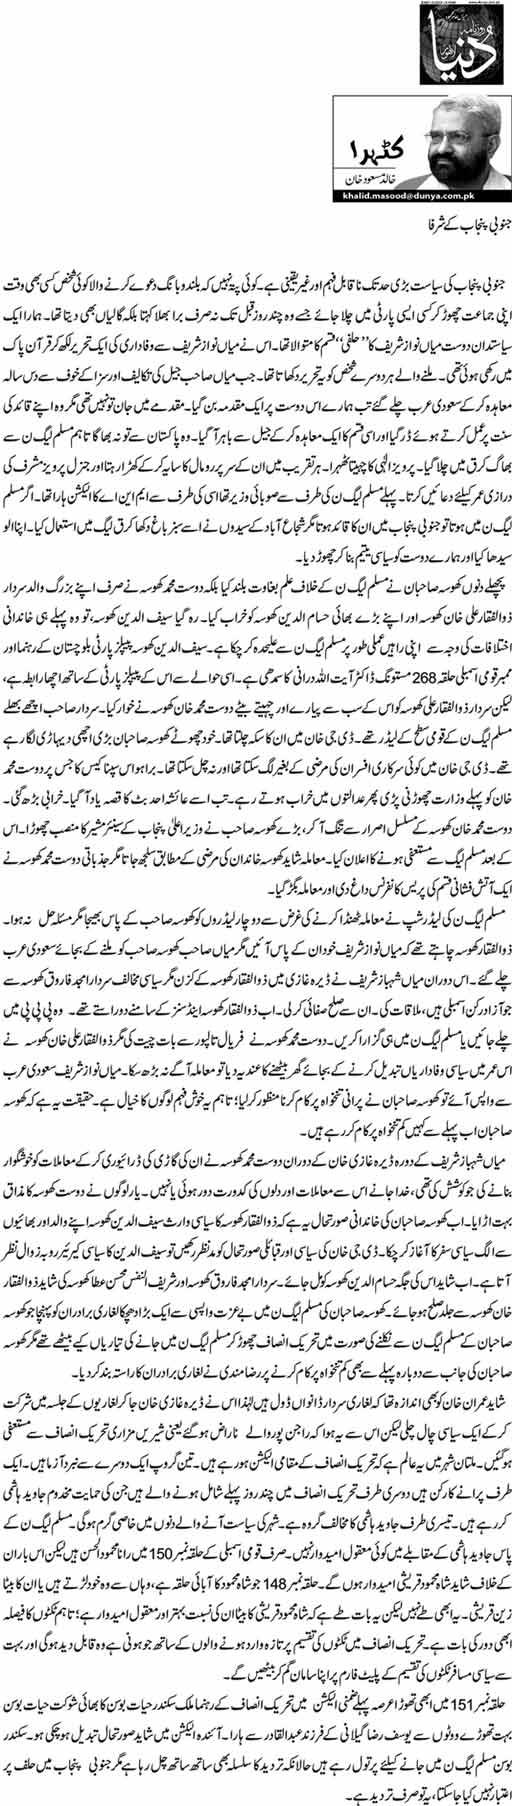 Junoobi Punjab k shurfa - Khalid Masood Khan